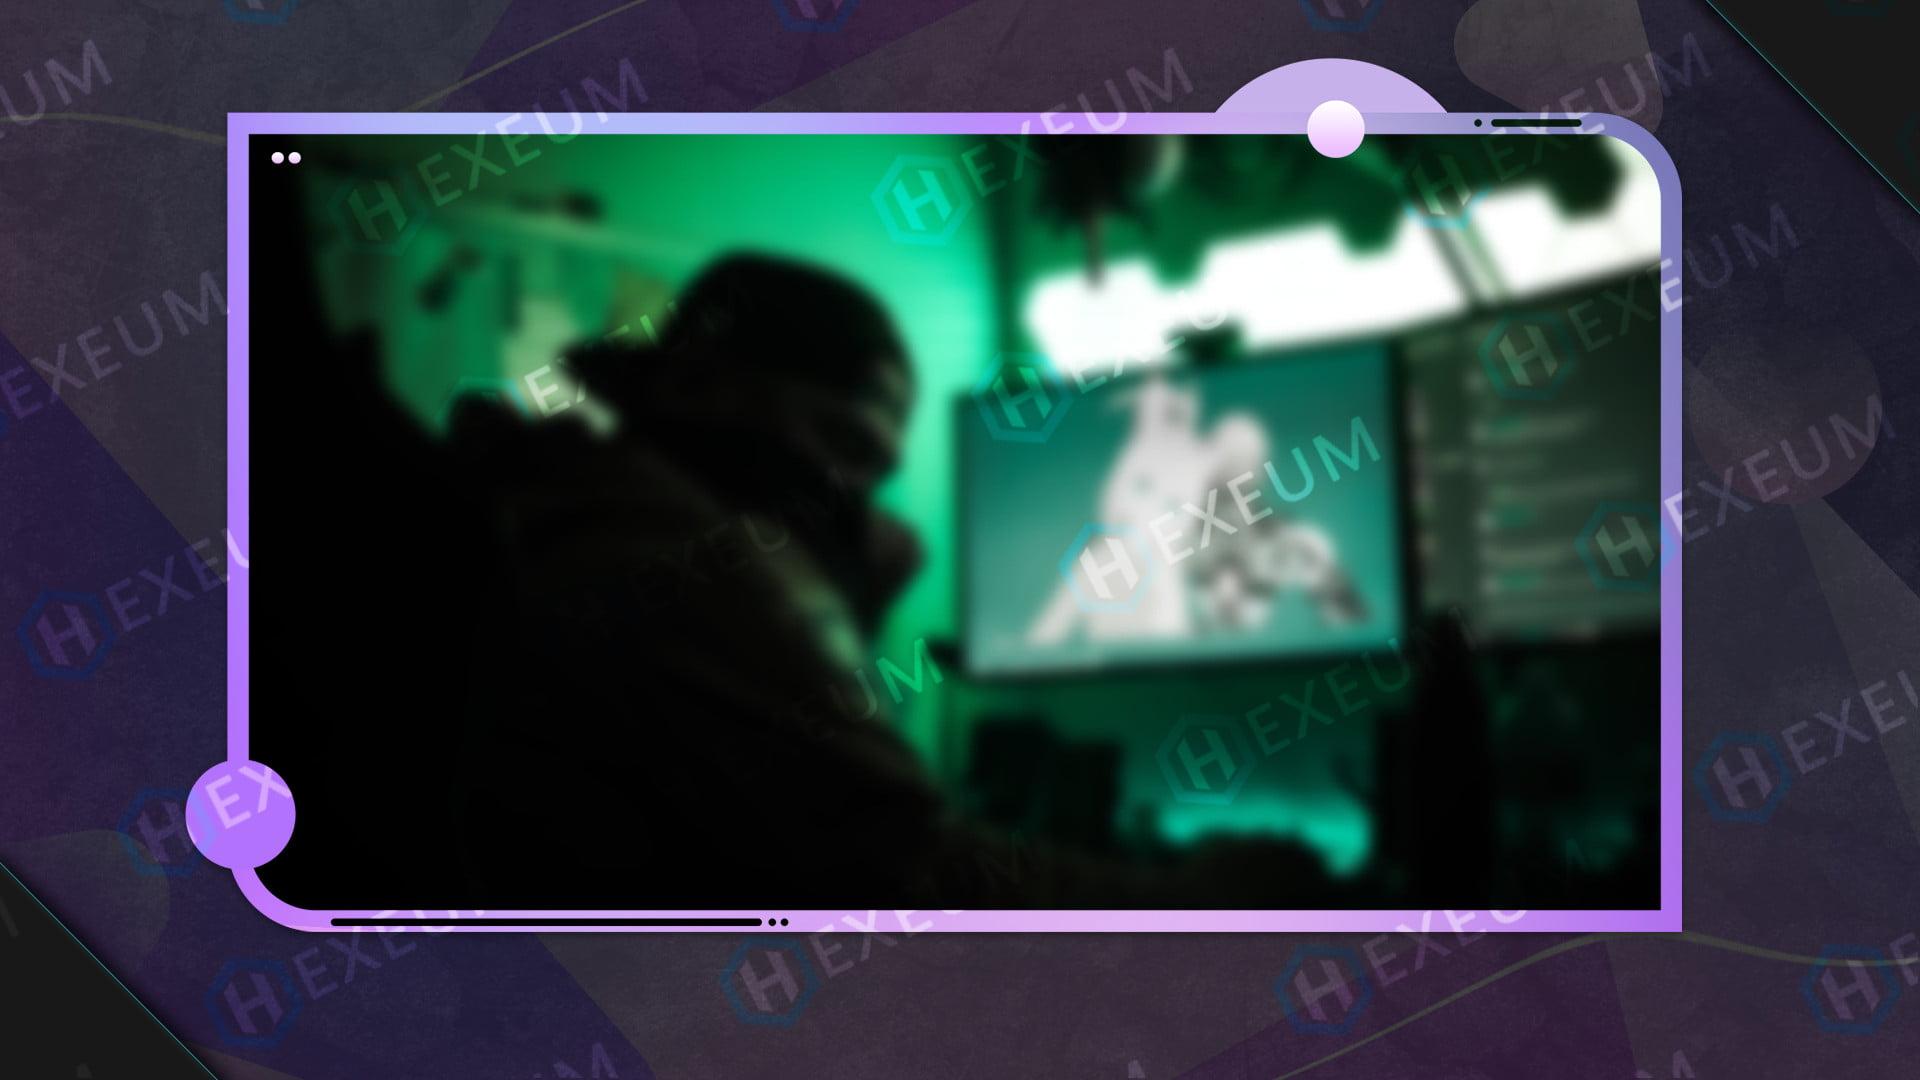 Dreamy Pink Webcam Overlay